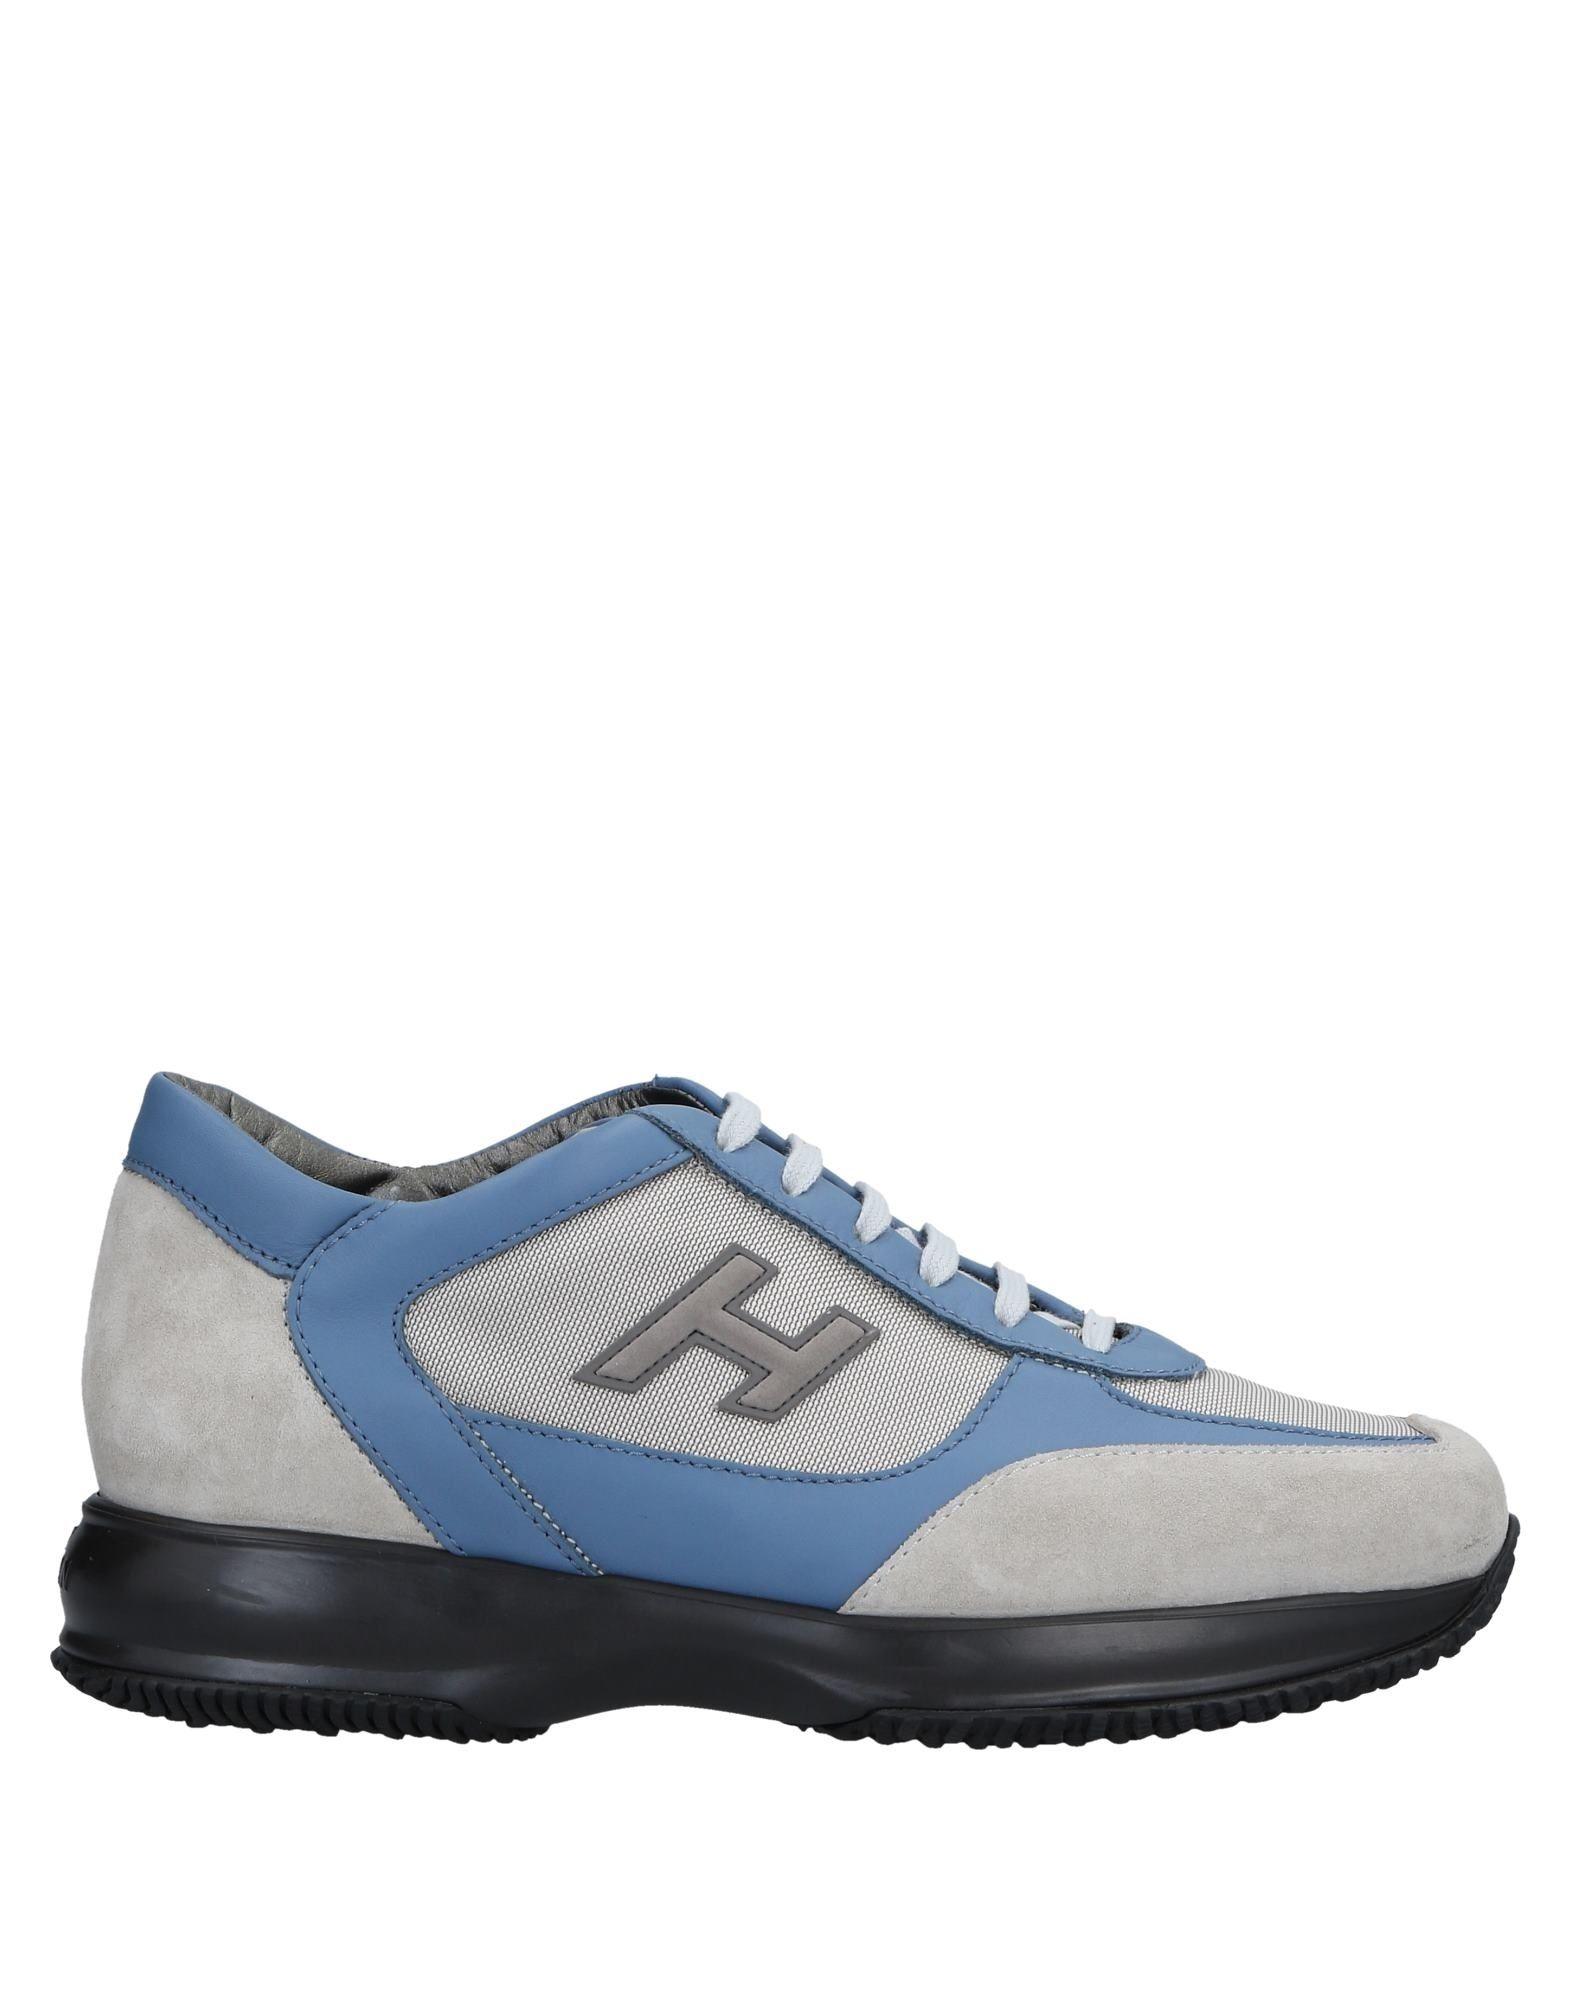 Hogan Sneakers Herren  11539439FN Gute Qualität beliebte Schuhe